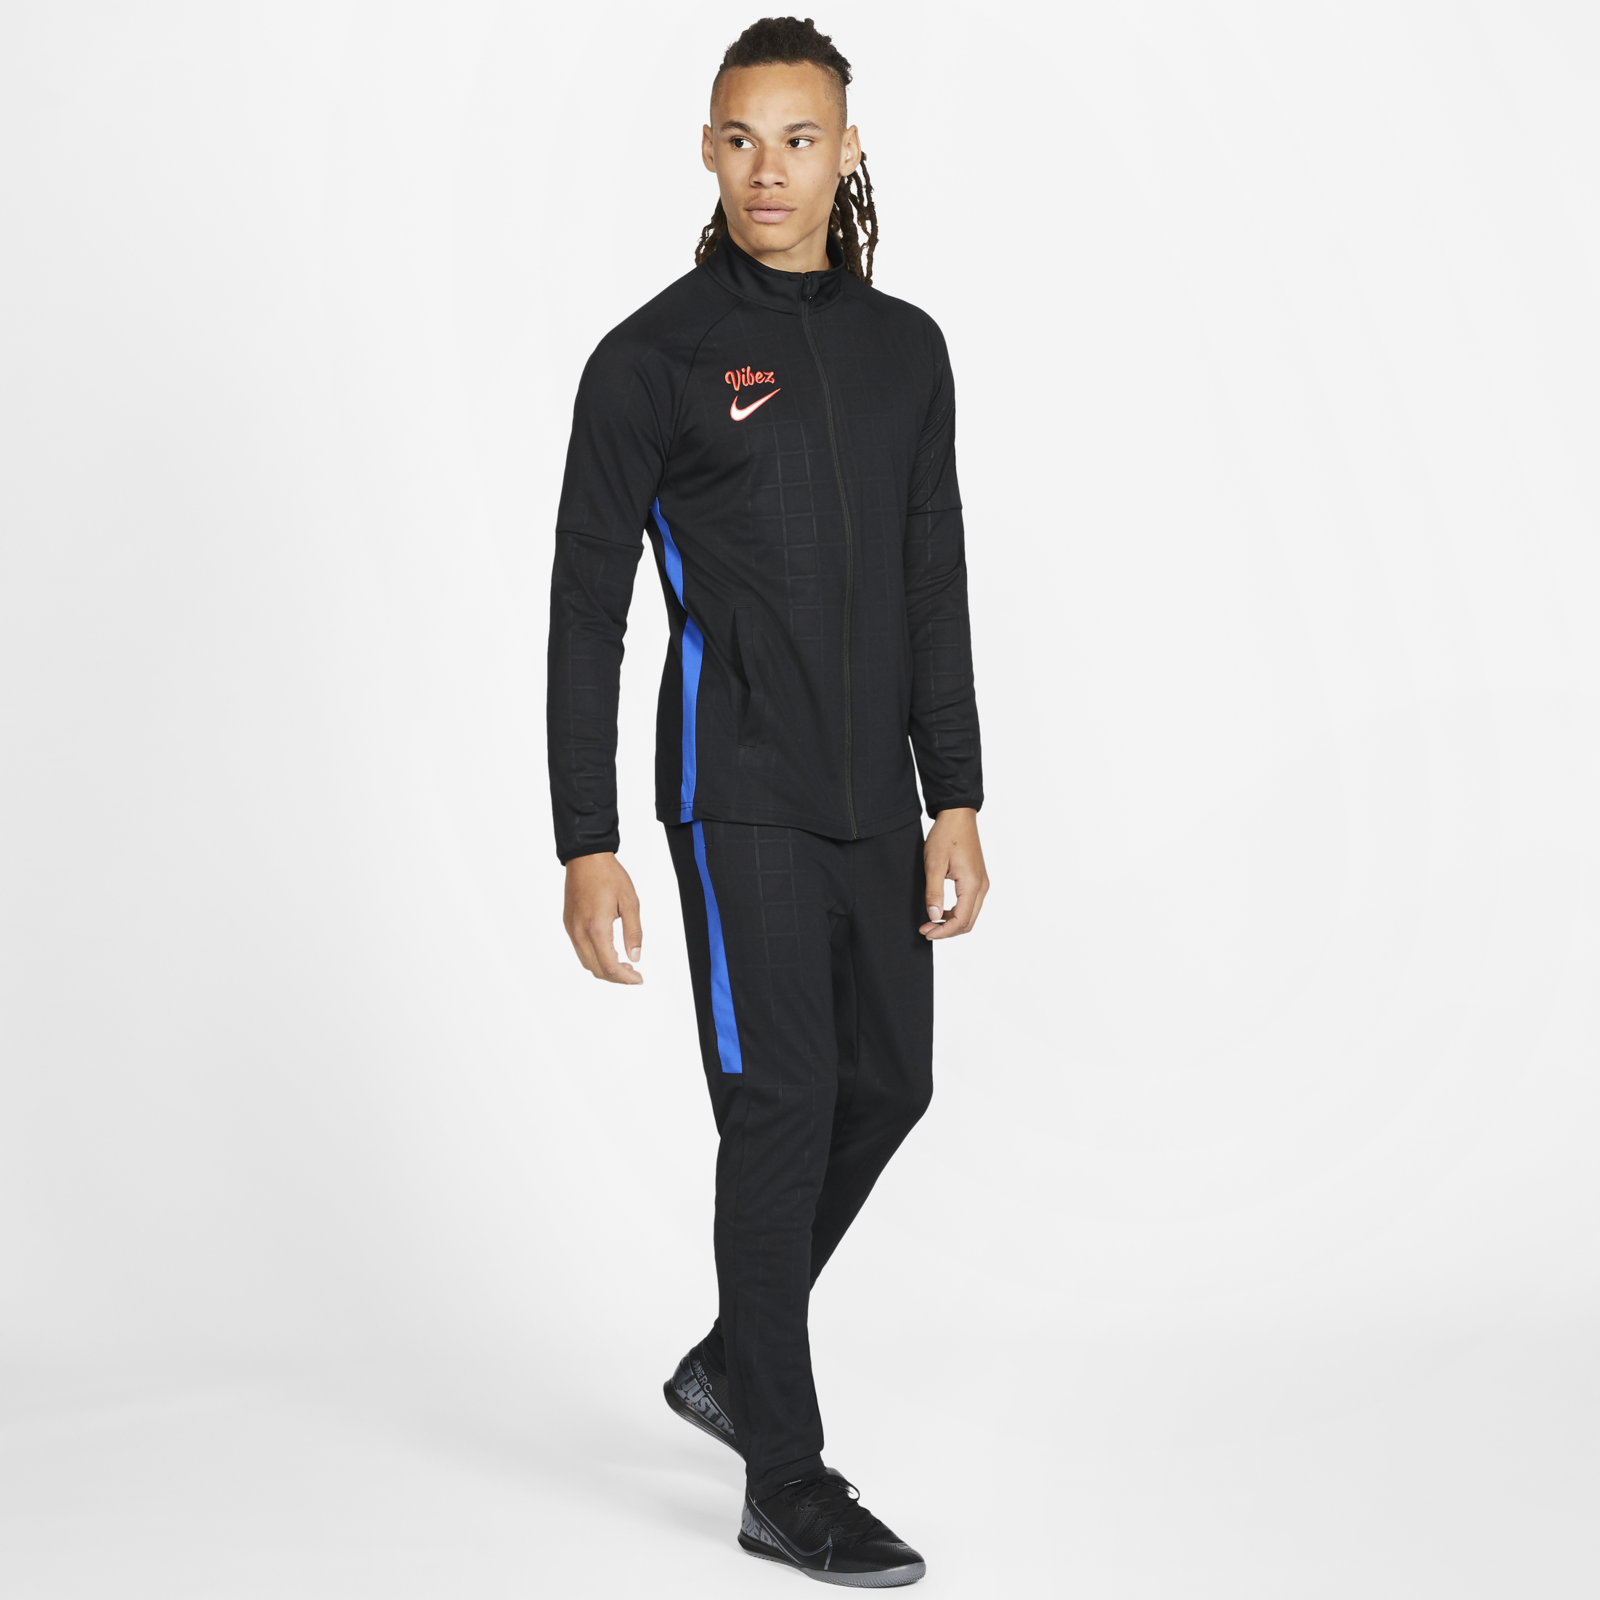 Nike SE11 Sancho Collection 8